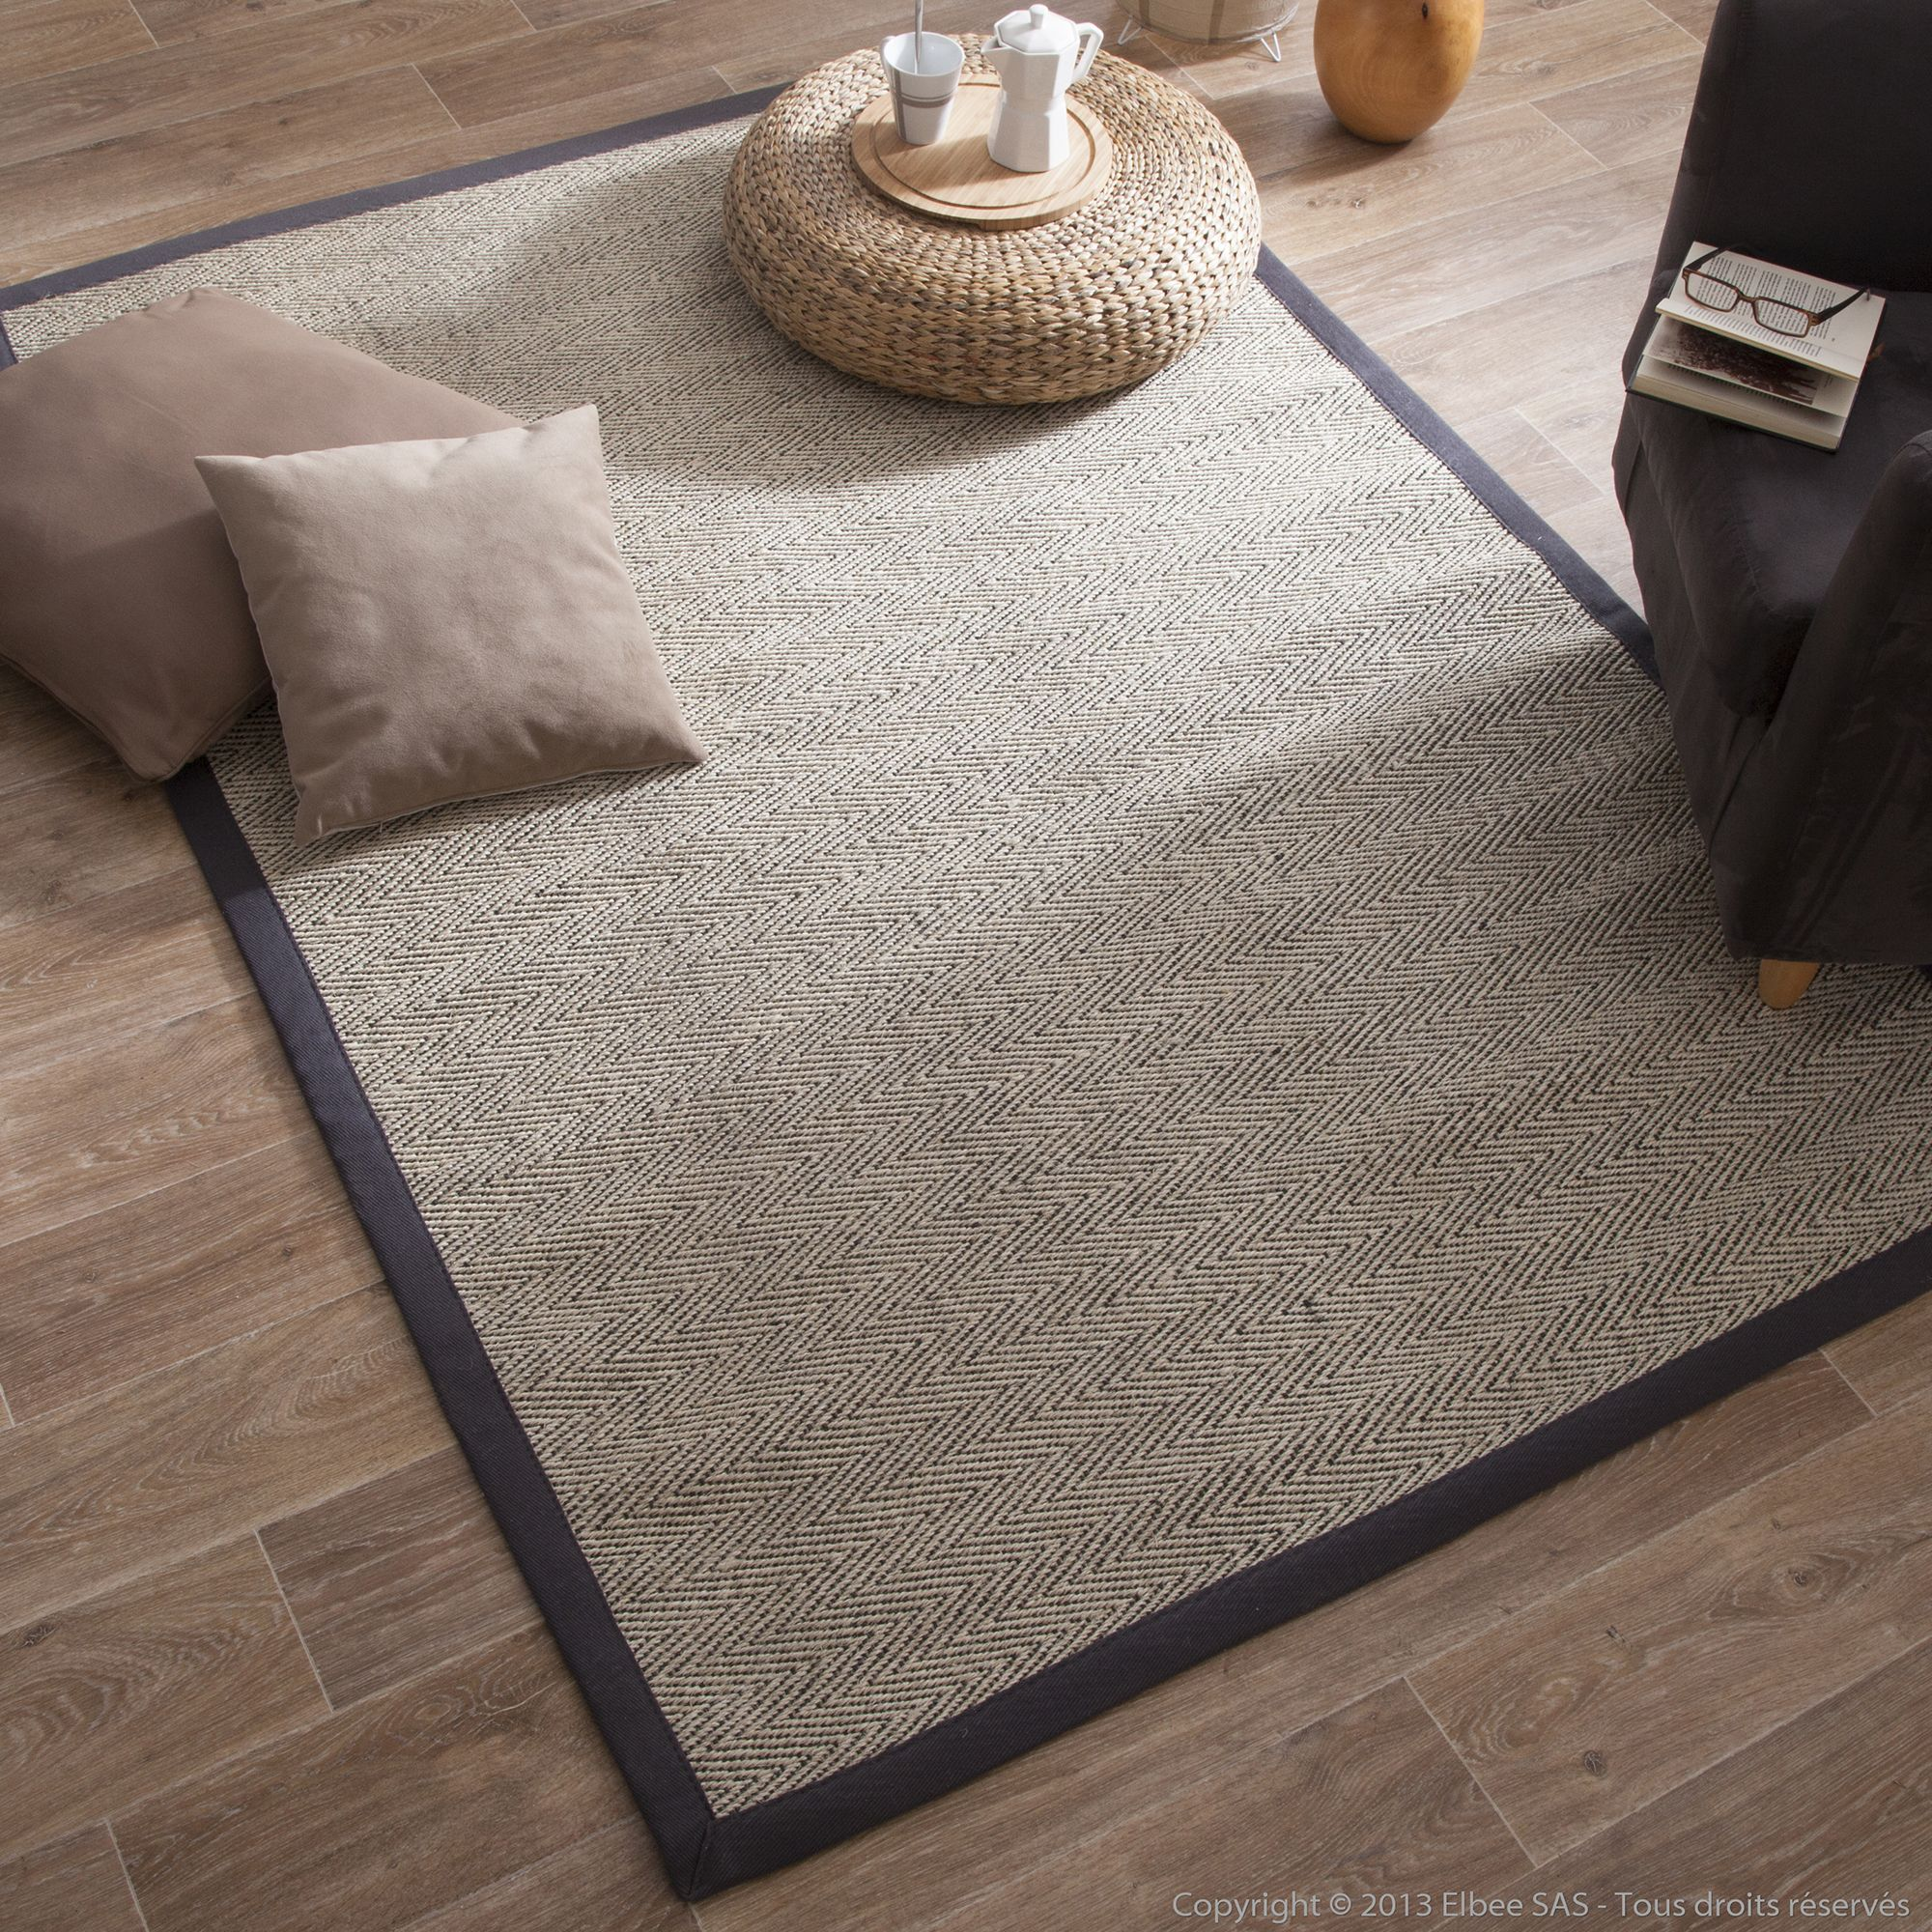 tapis sisal bicolore chevrons avec ganse en coton essential port offert - Tapis Sisal